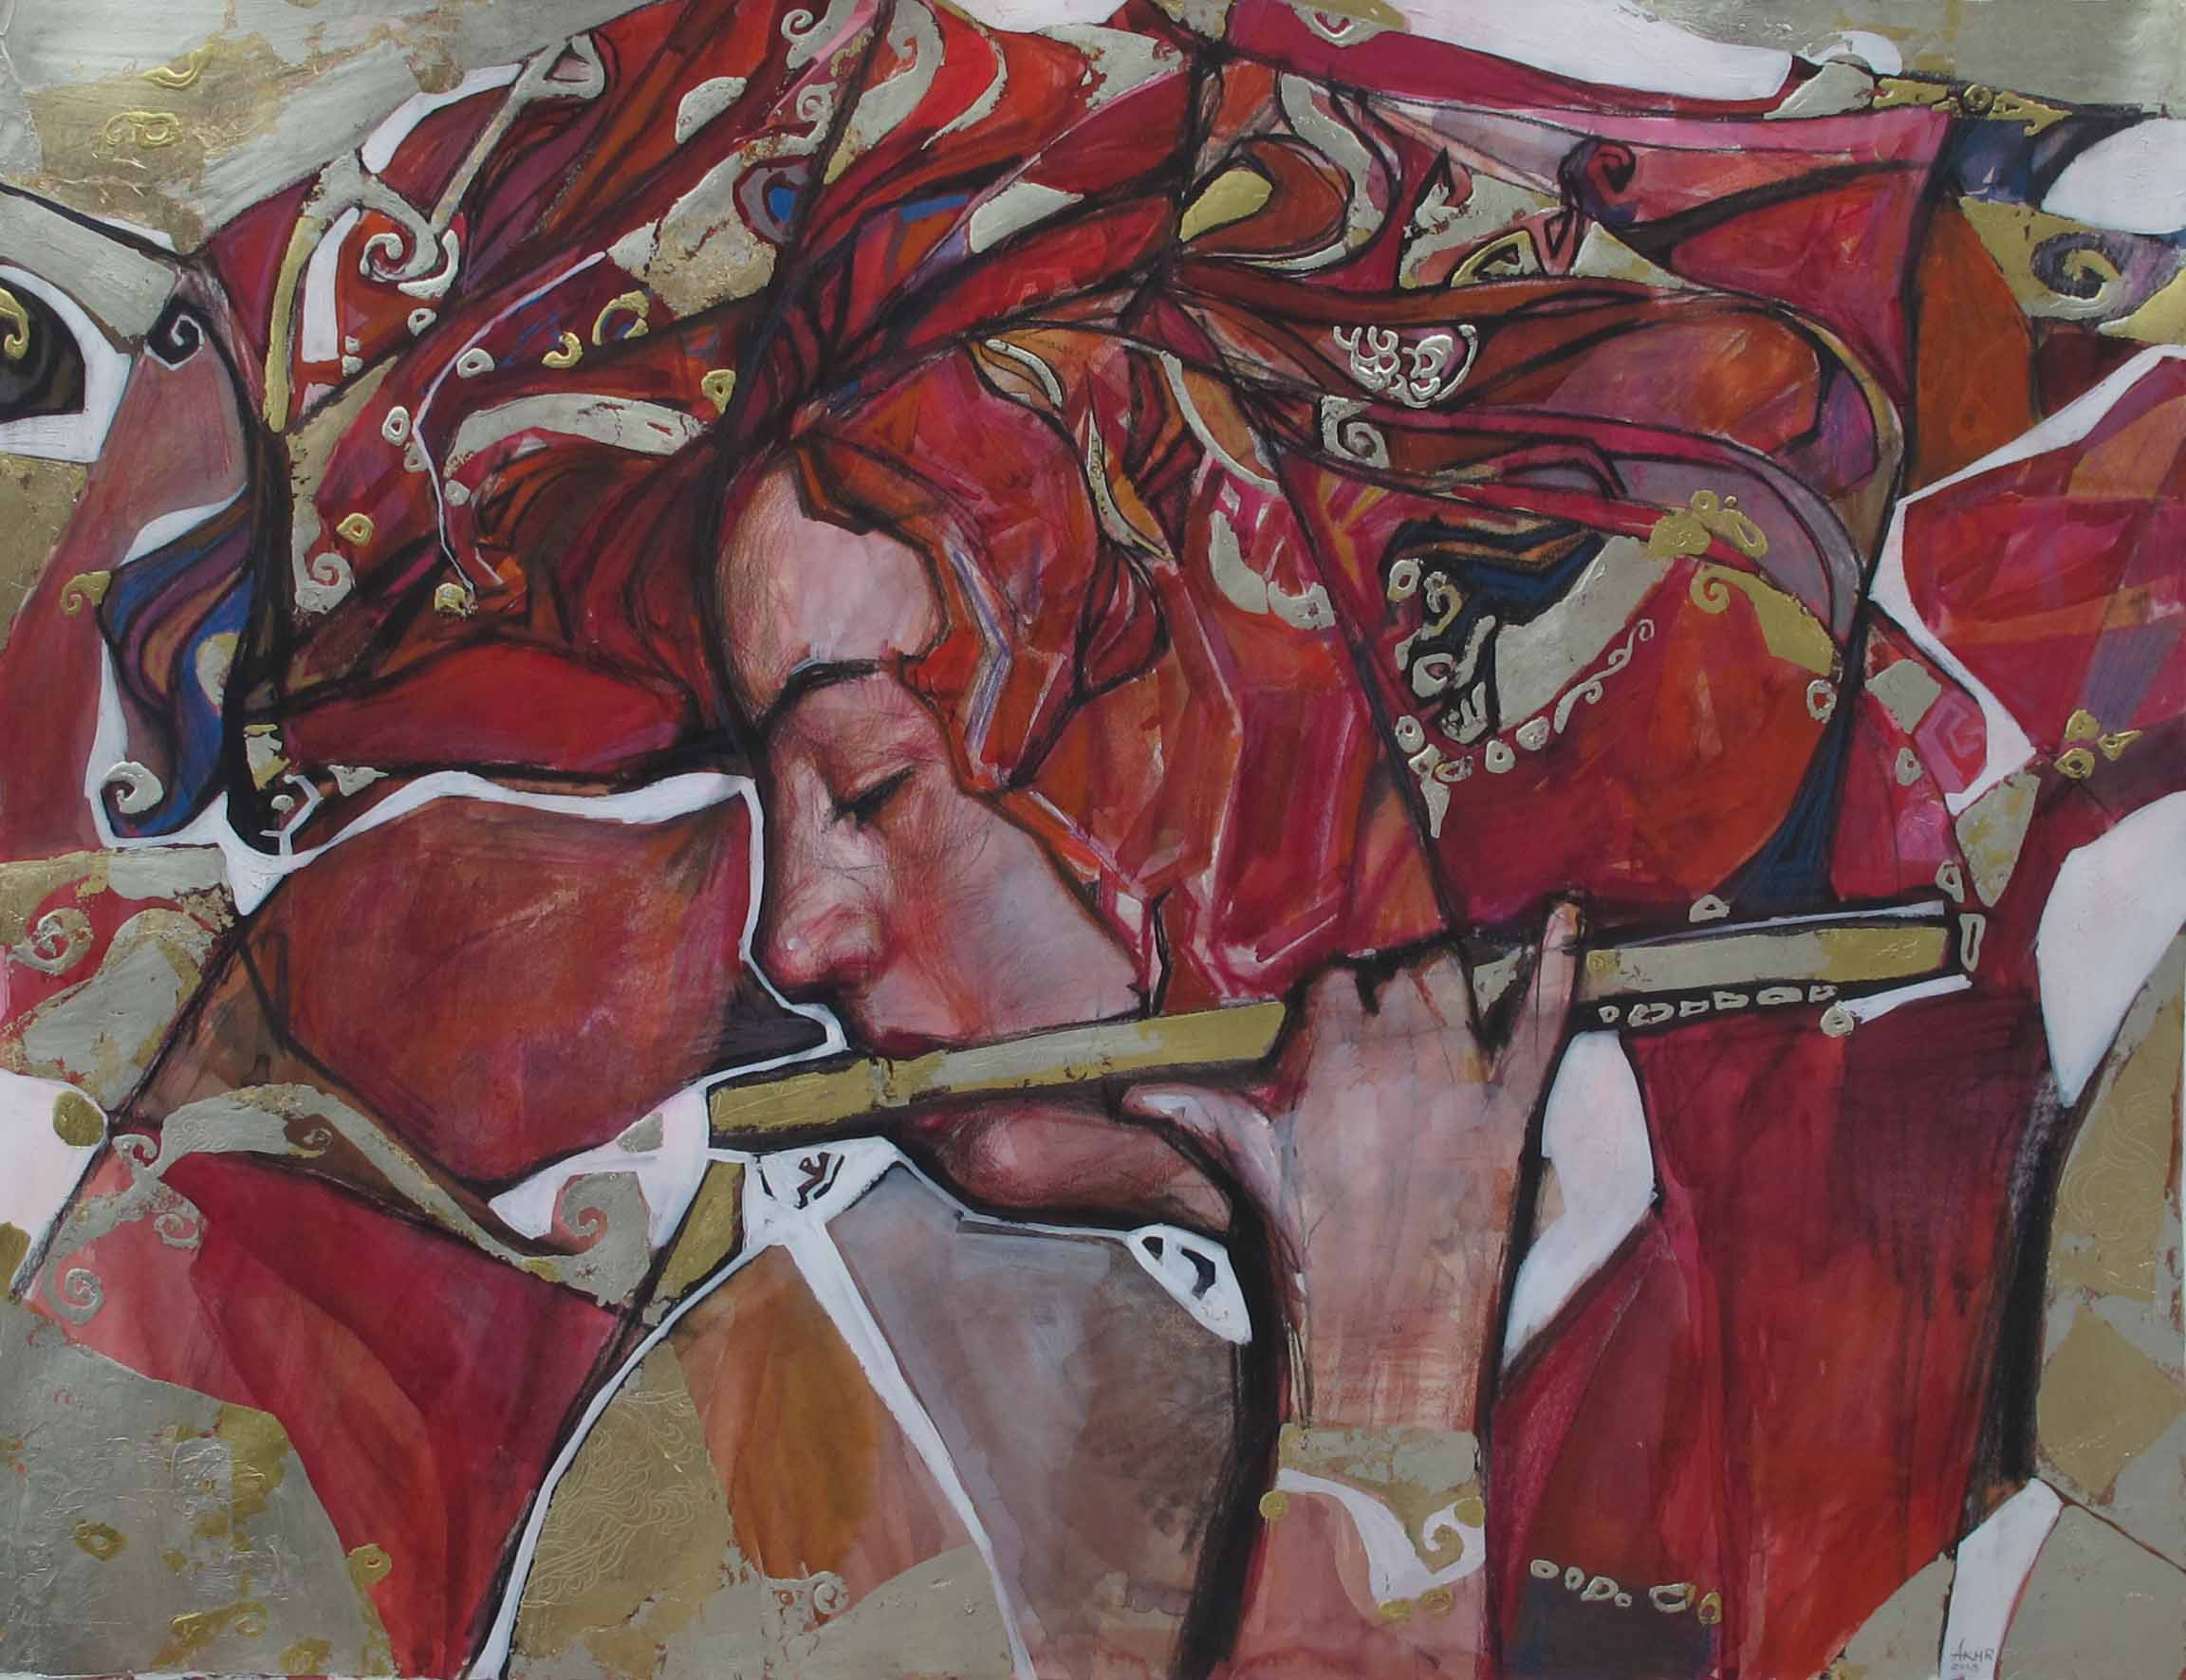 Muses Mosaic: Study IV by  Daud Akhriev - Masterpiece Online